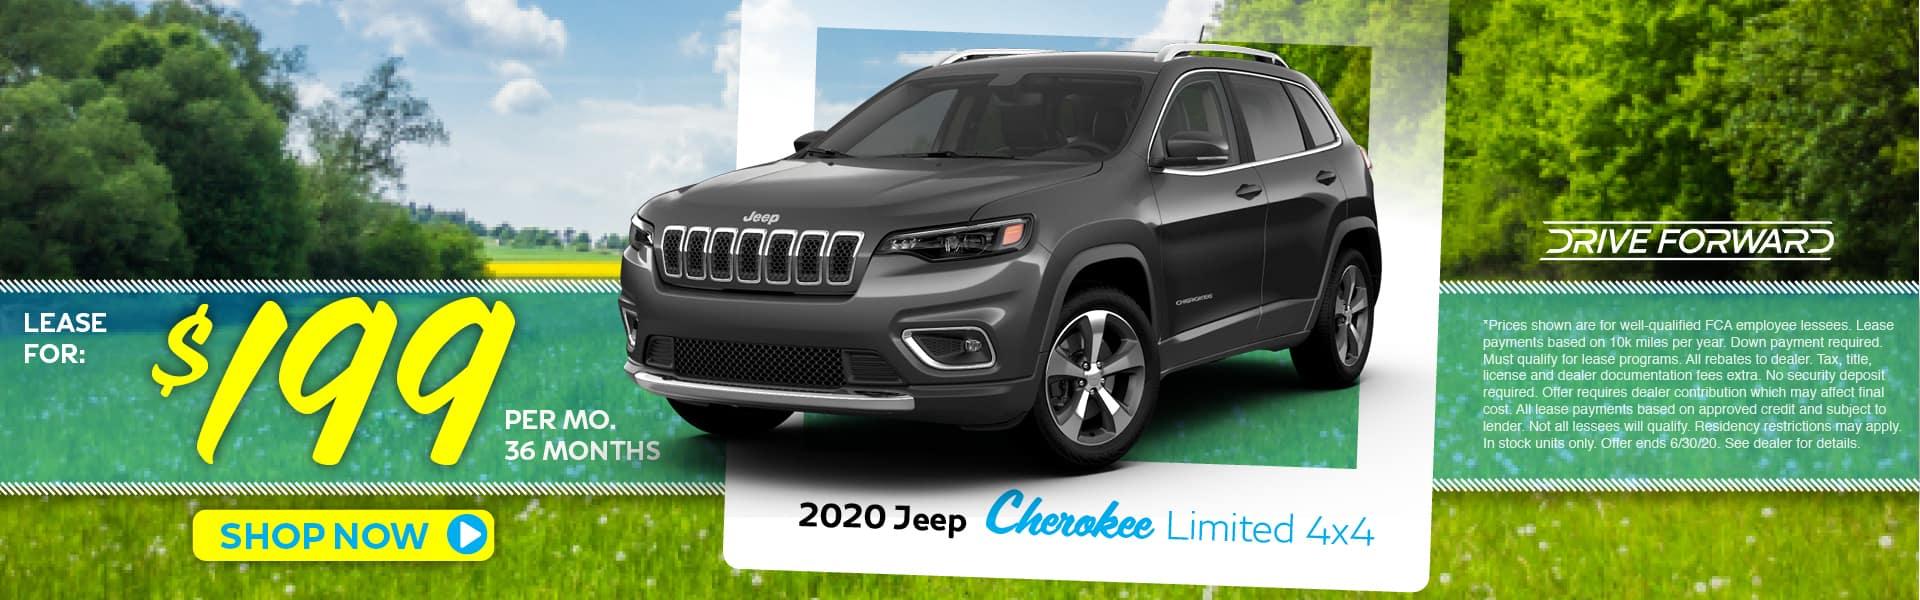 2020 Jeep Cherokee Lease Specials in Pinckney, MI